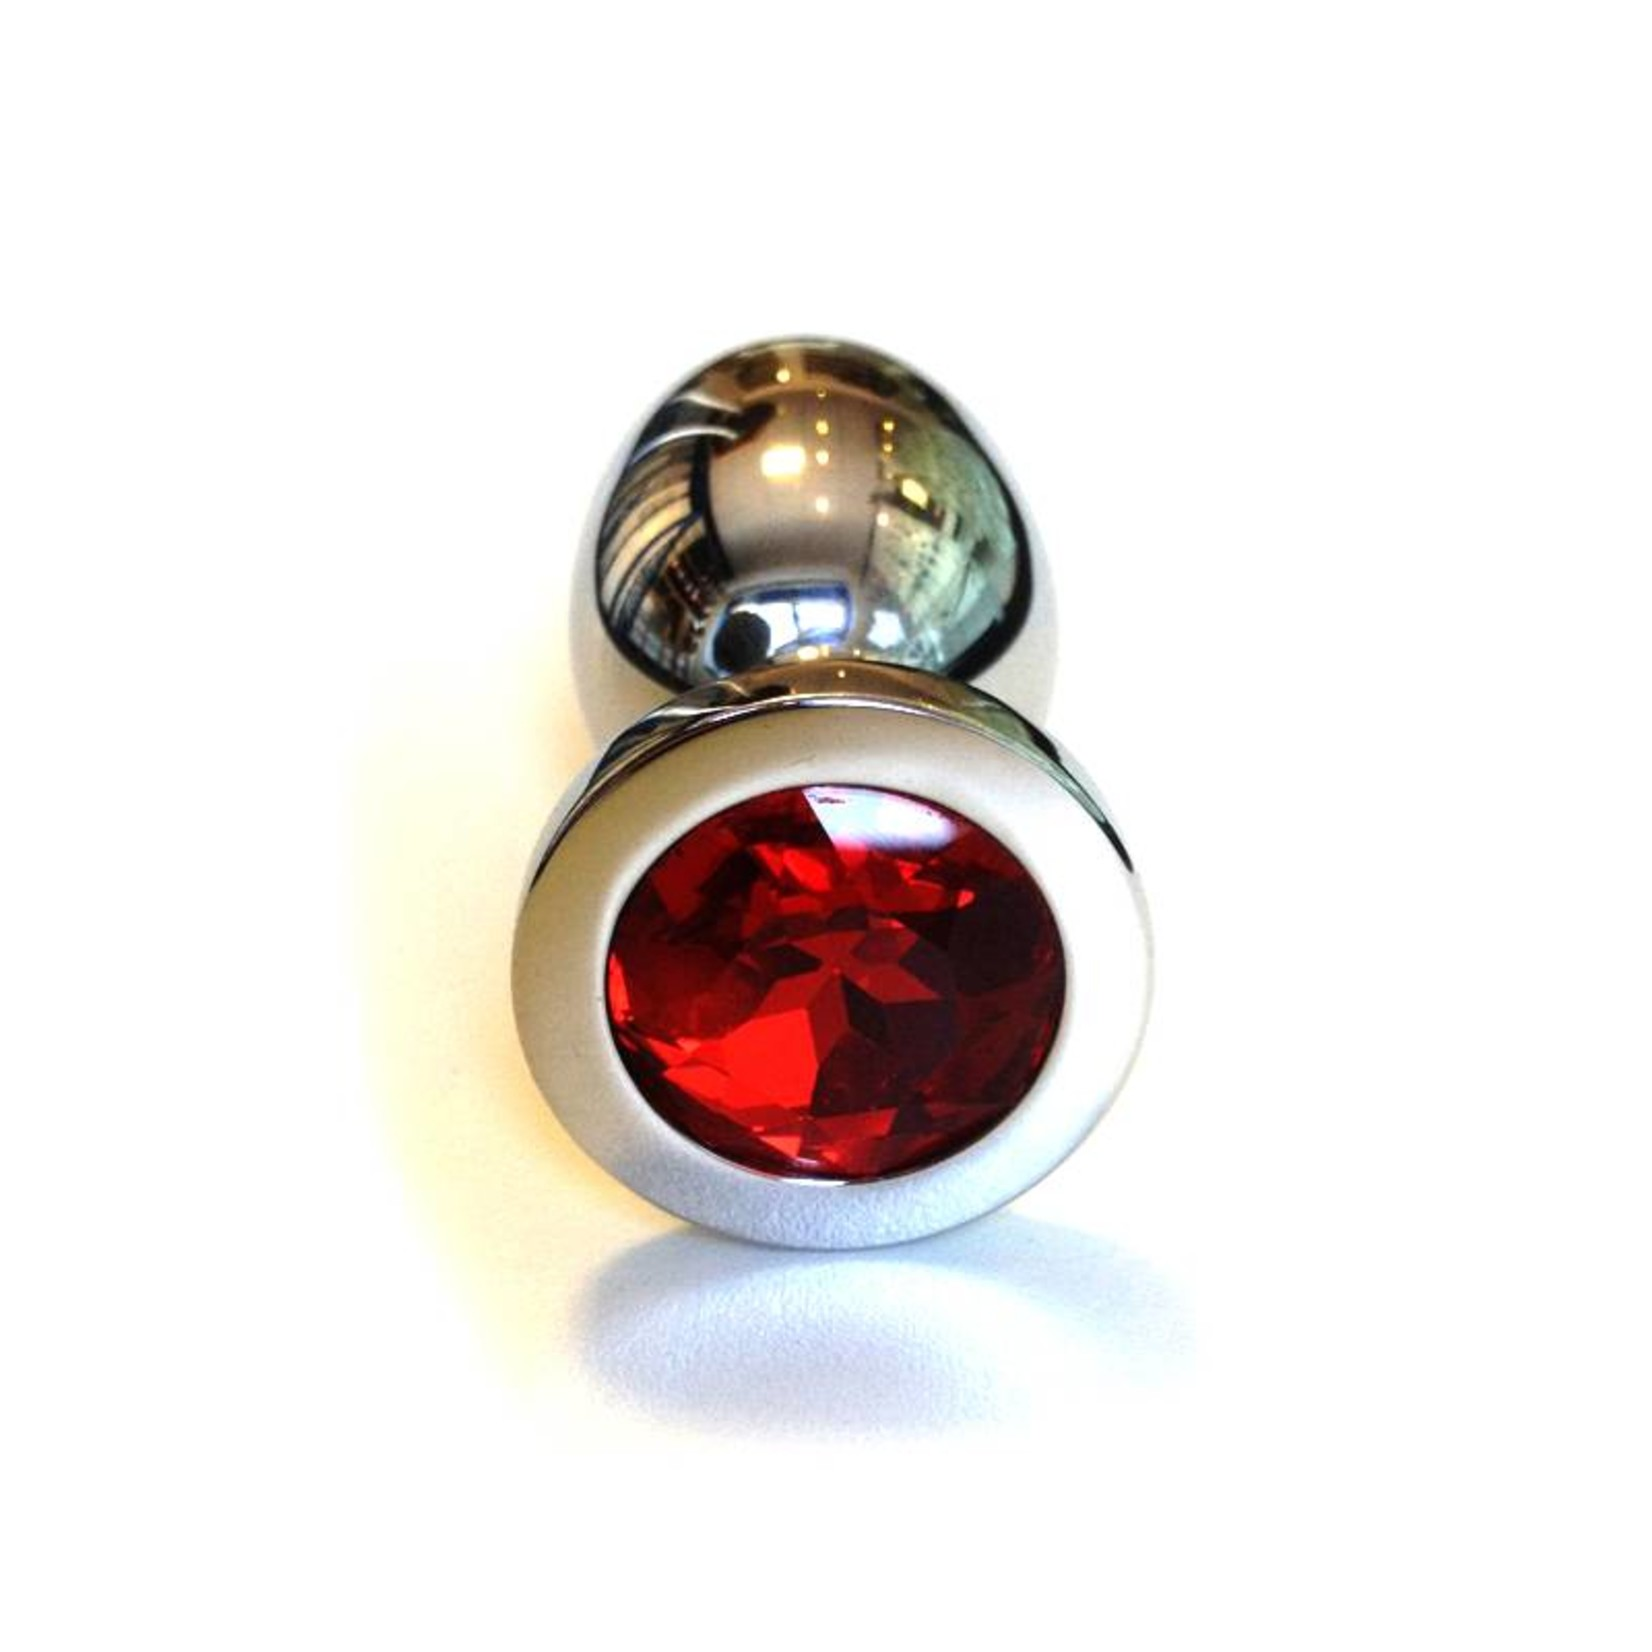 KIOTOS Steel Jewel Buttplug Large Red